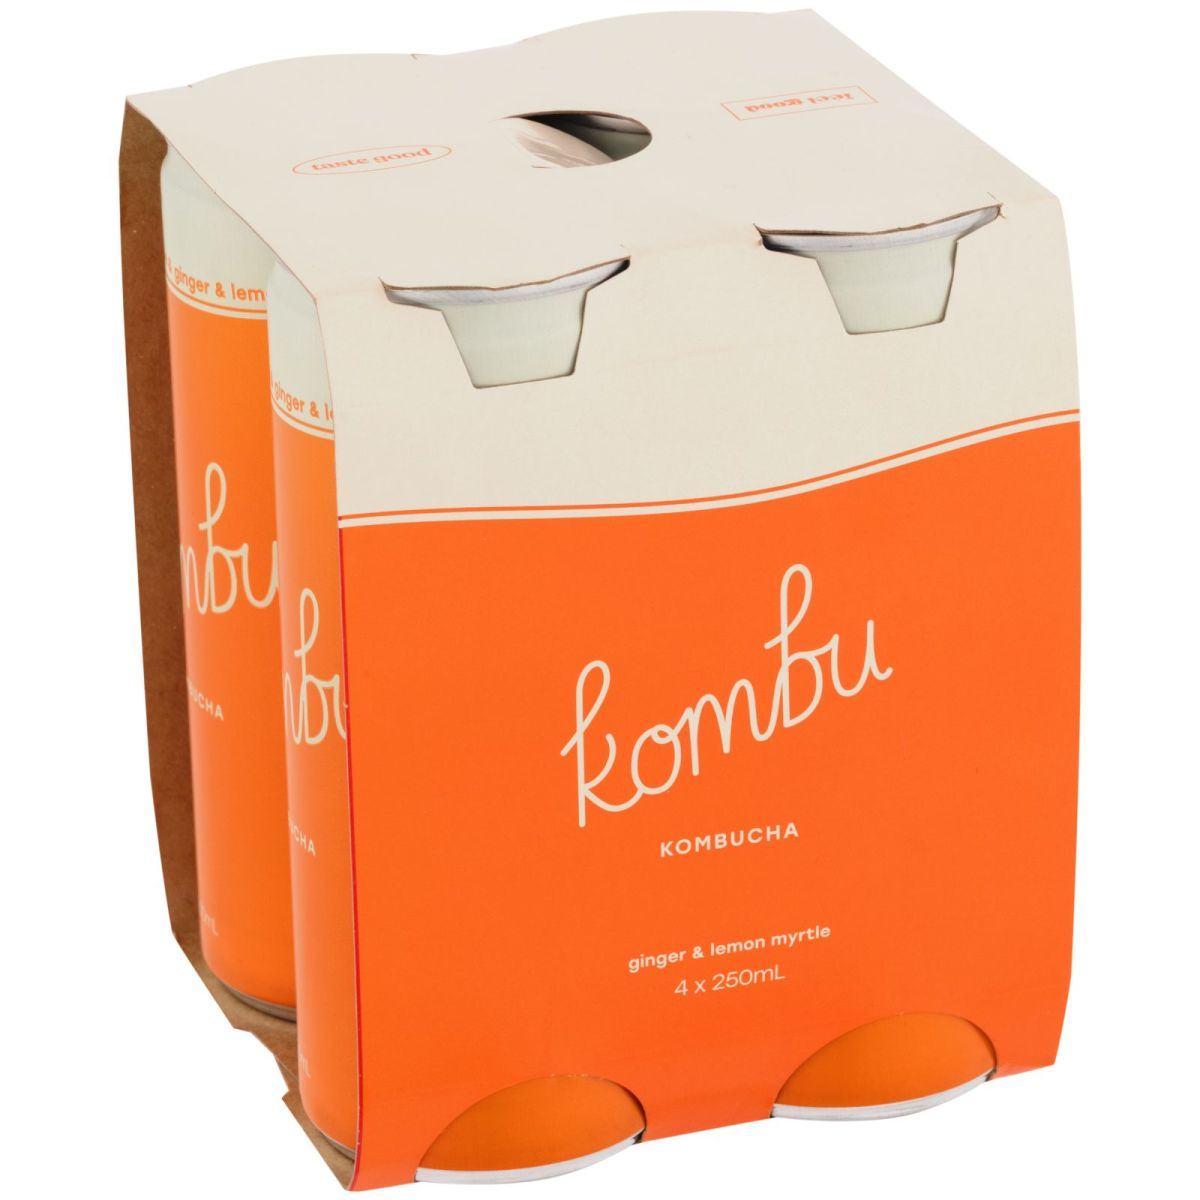 Kombu Kombucha - Ginger & Lemon Myrtle Kombucha